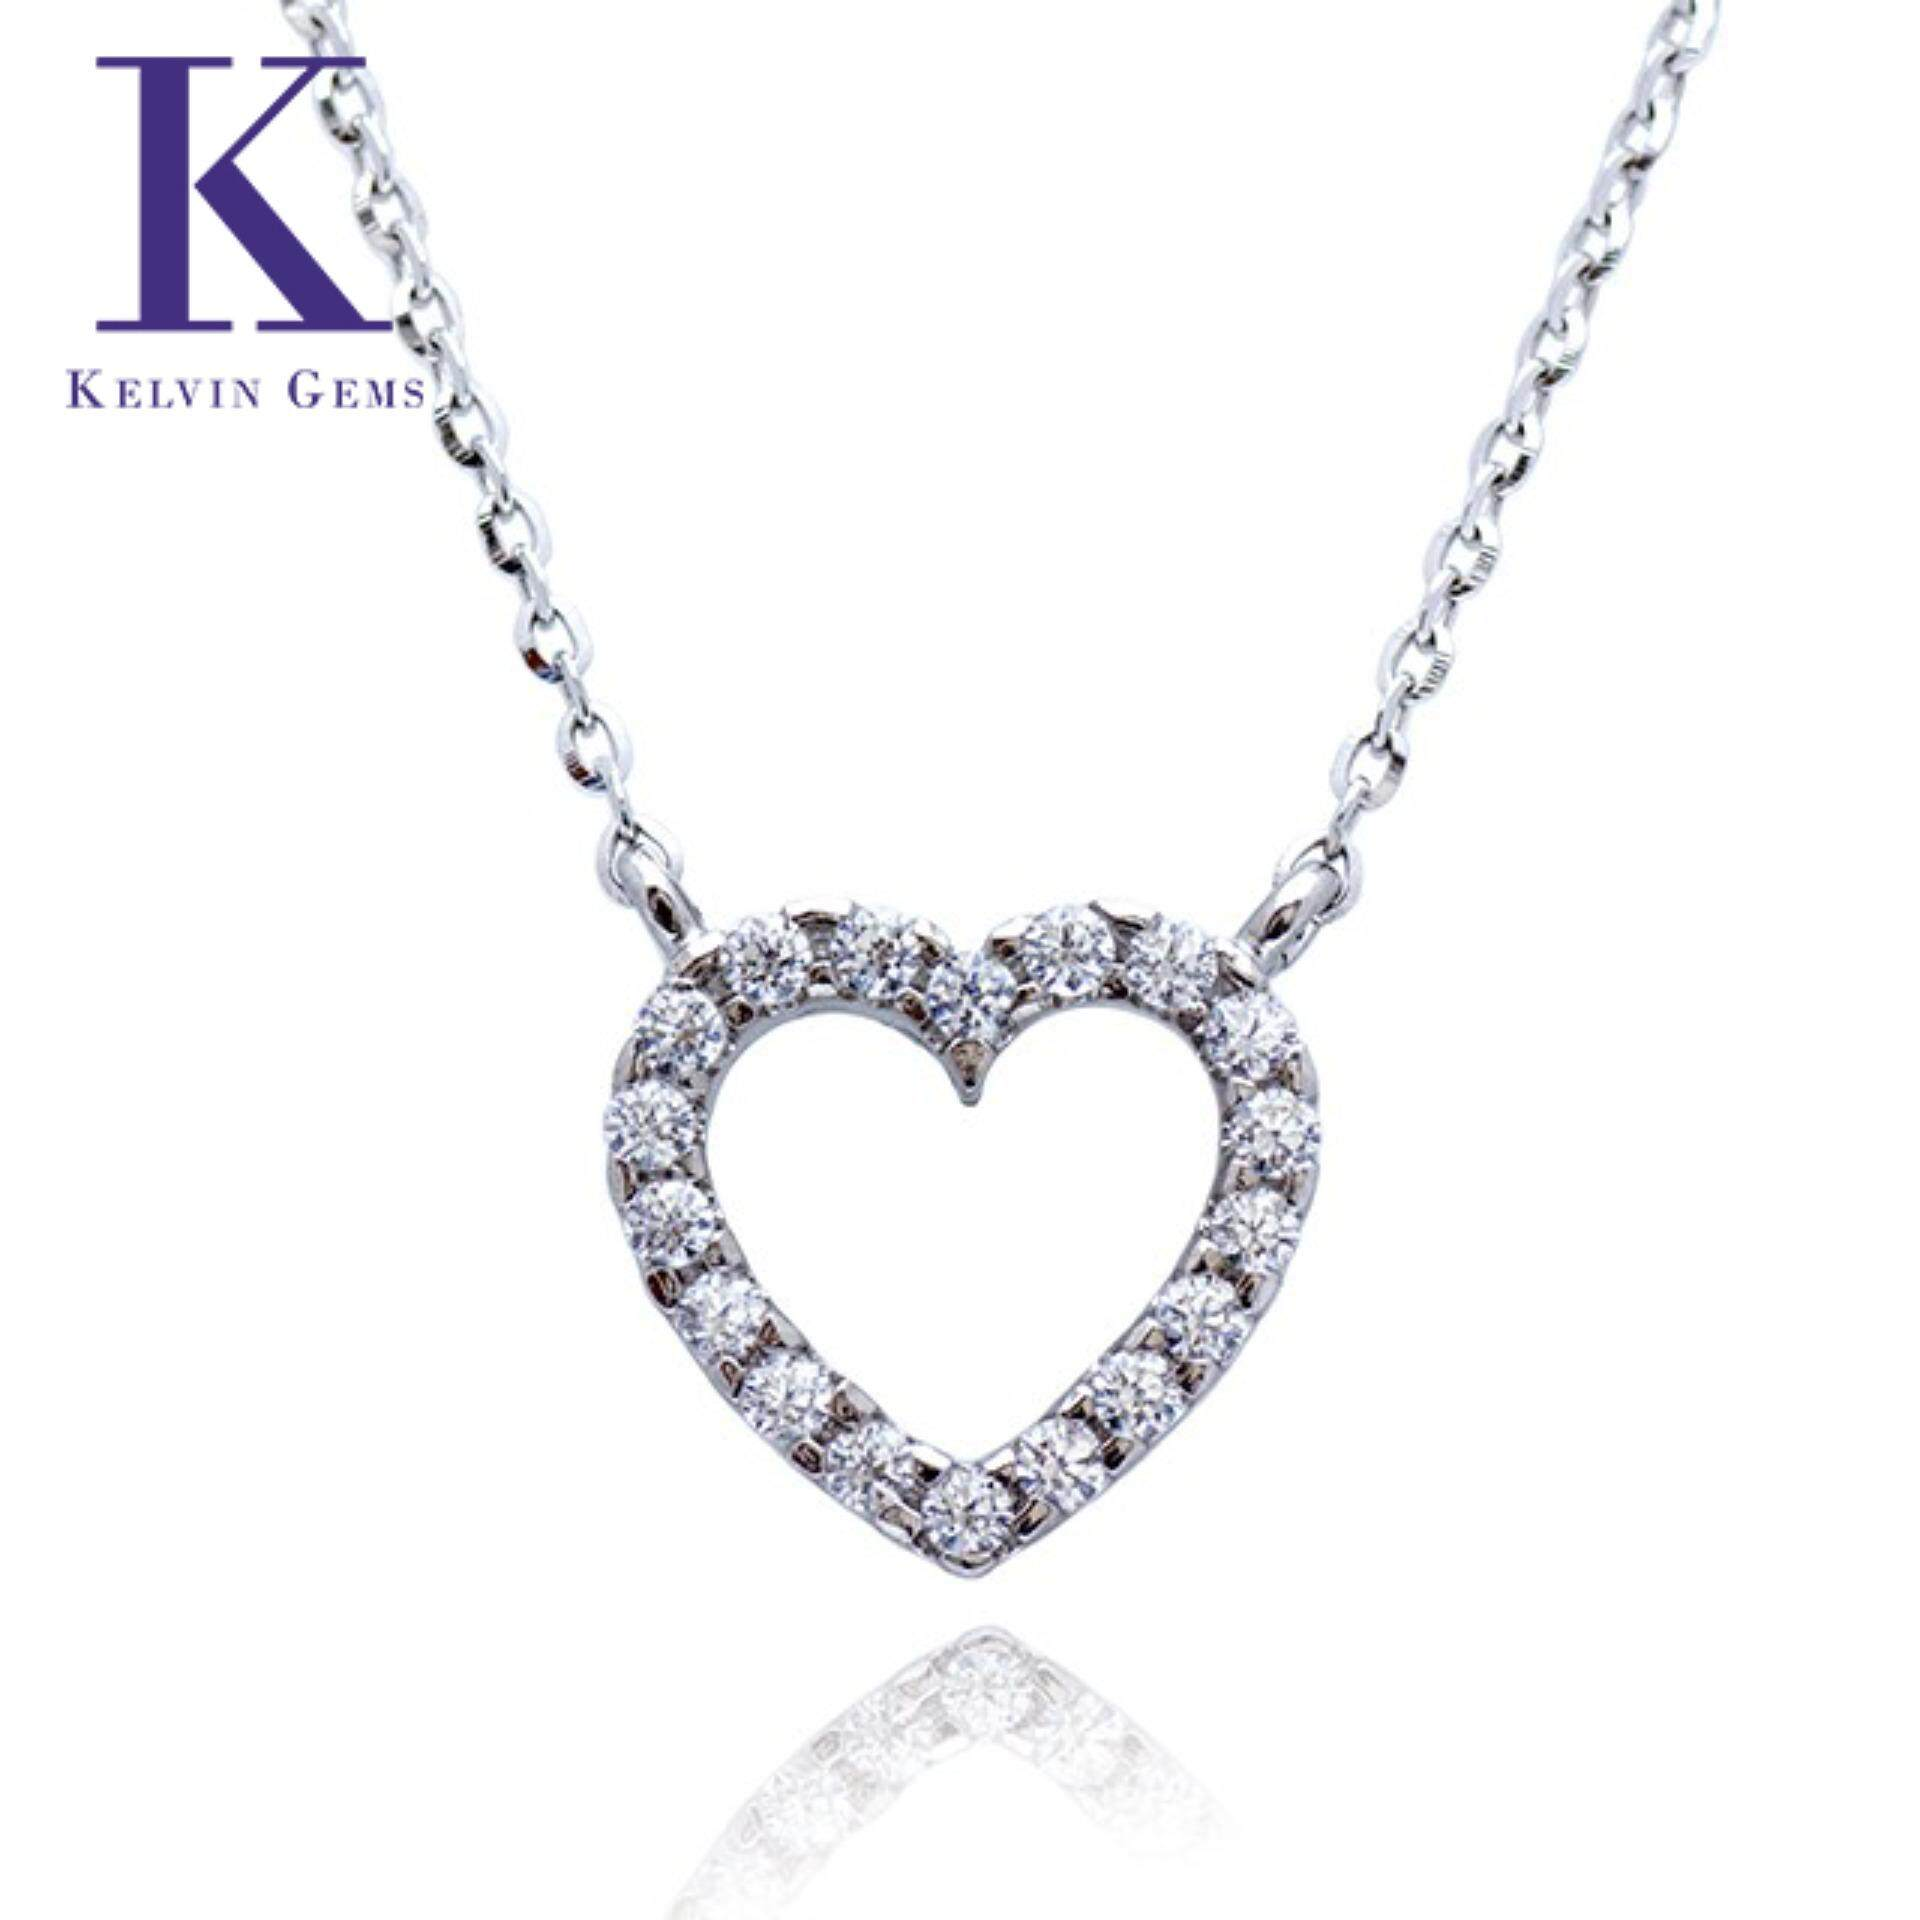 Kelvin Gems Premium My Heart Pendant Necklace m/w Swarovski Zirconia